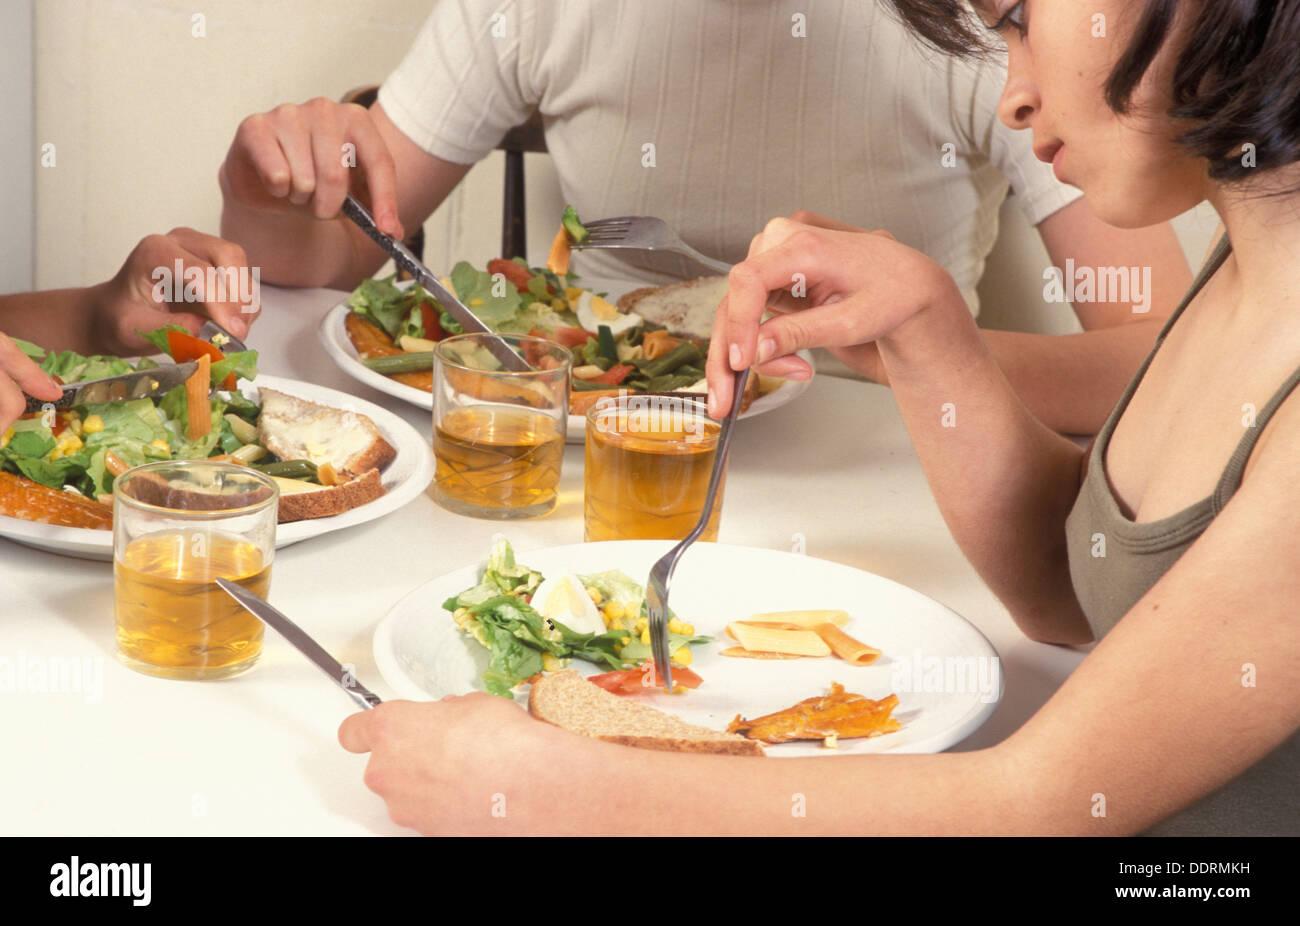 teenage girl with eating disorder - Stock Image